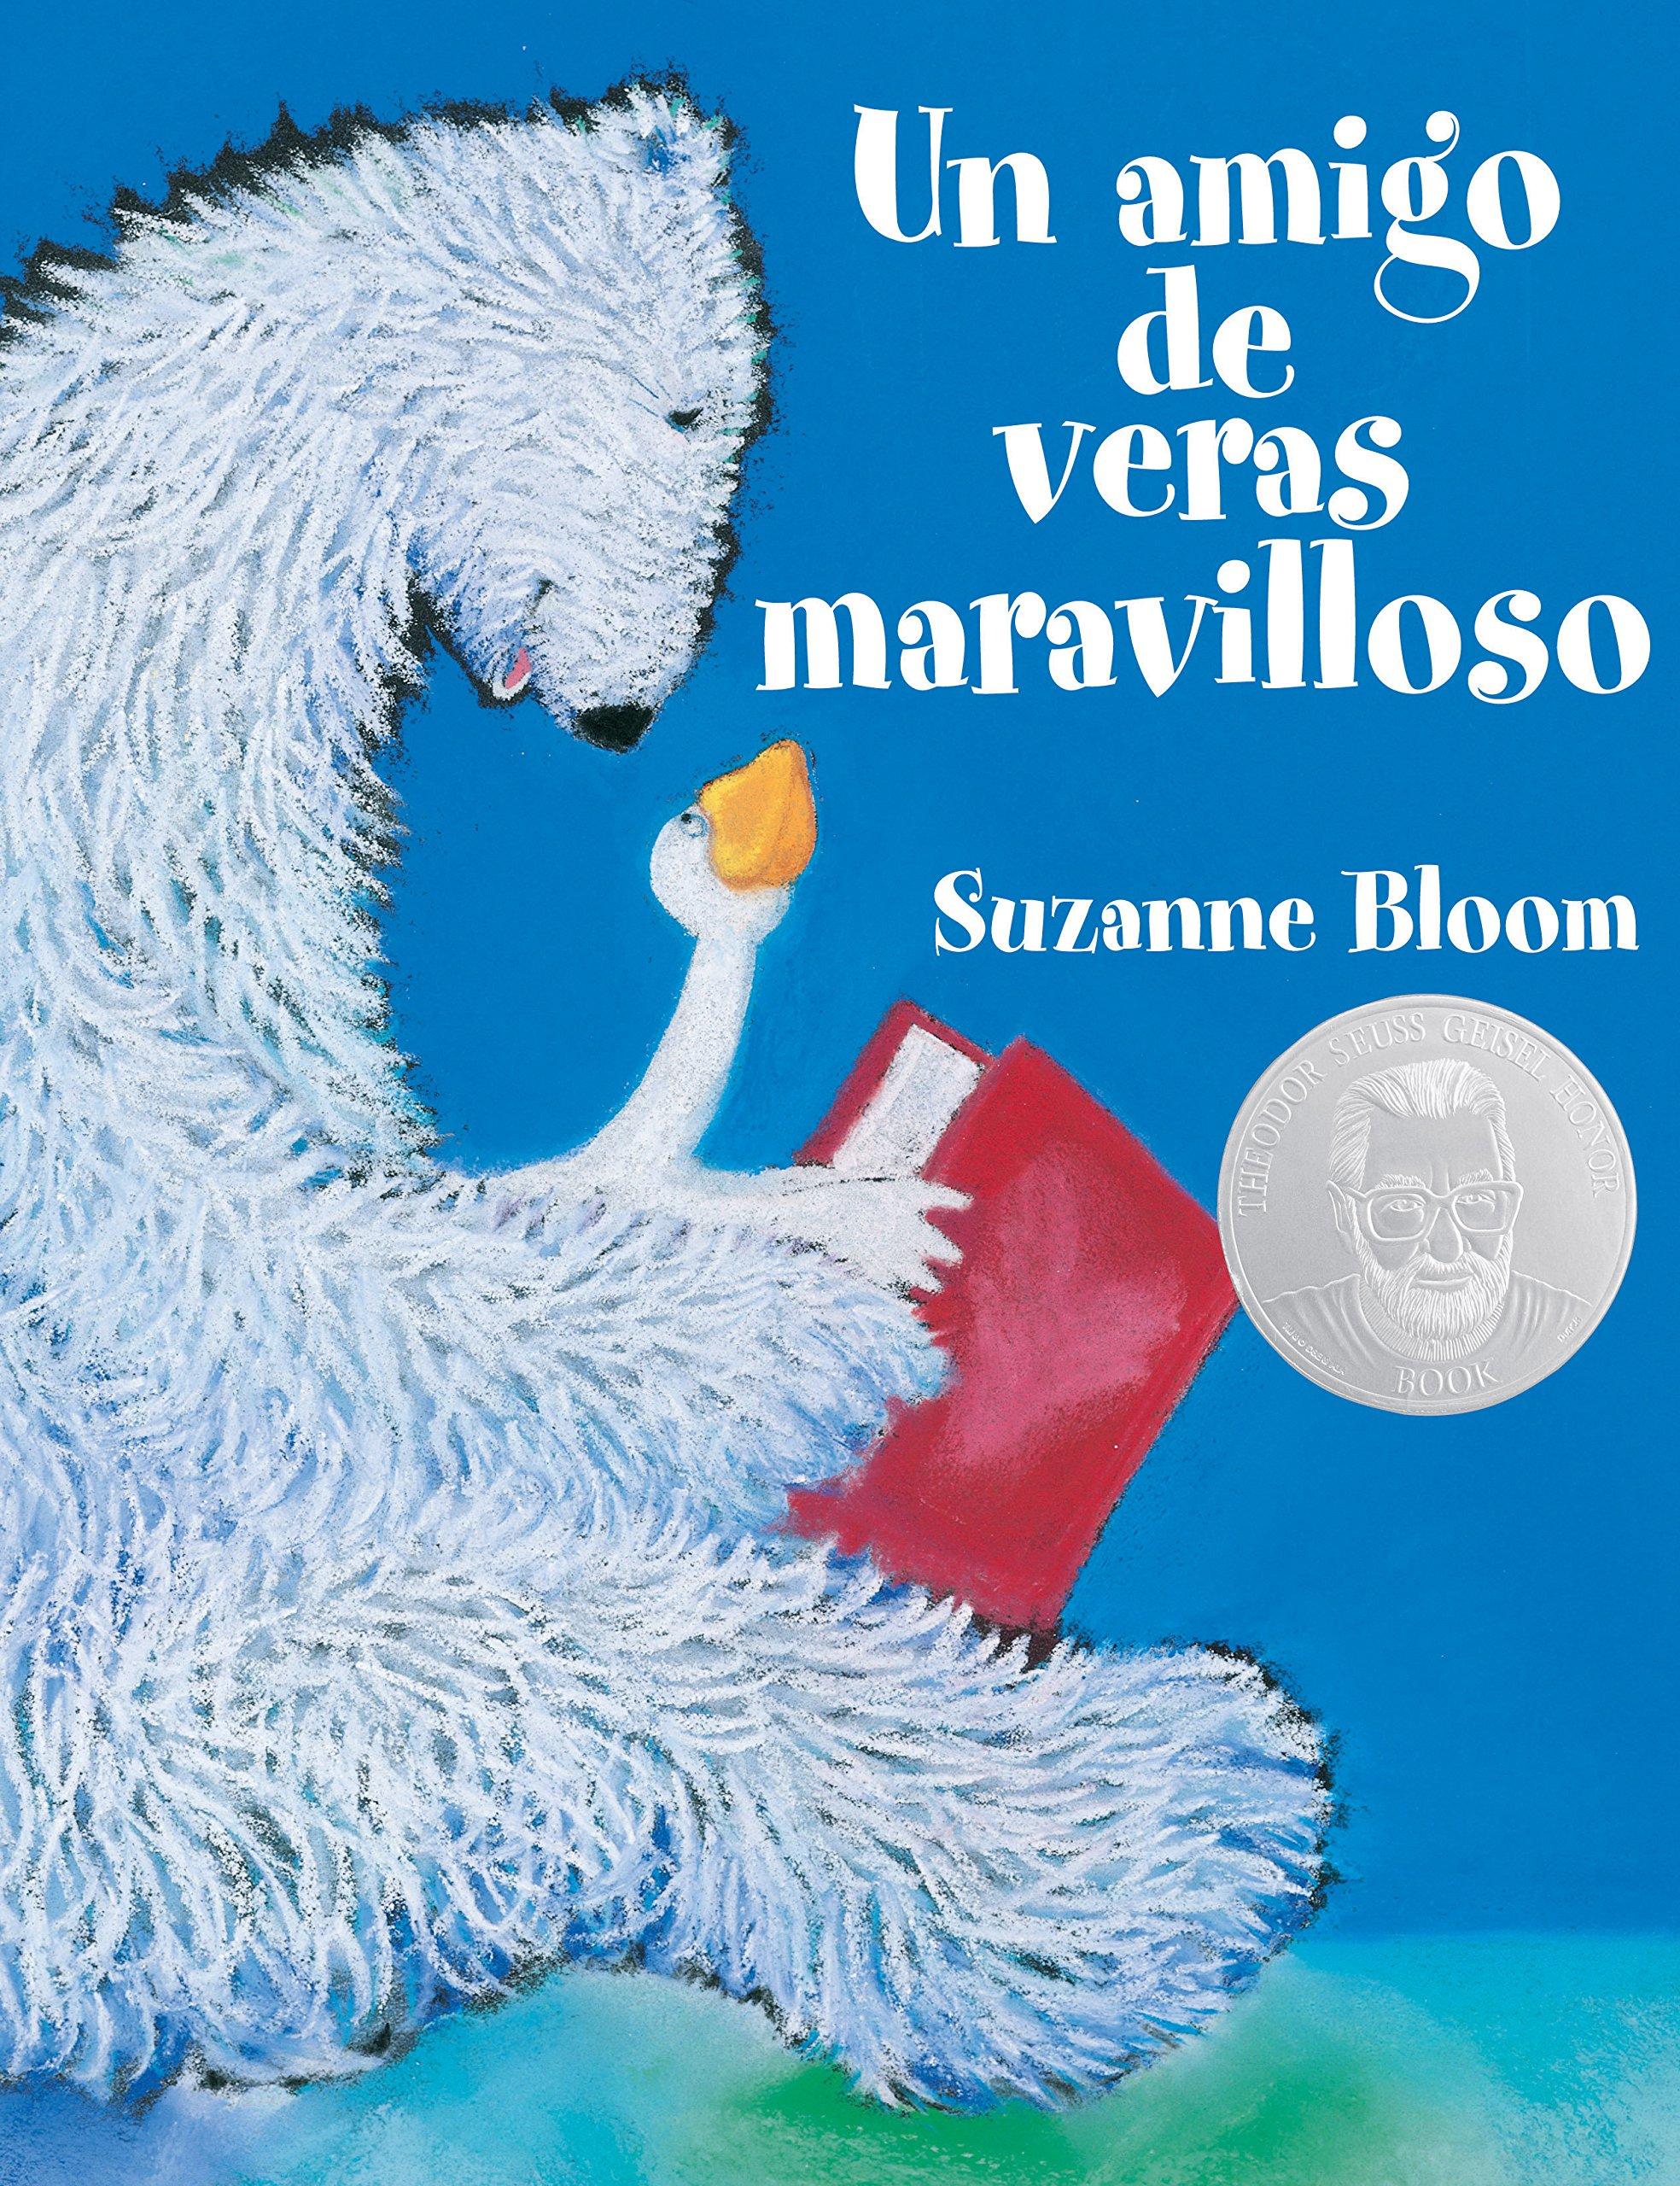 Un amigo de veras maravilloso (A Splendid Friend, Indeed) (Goose and Bear Stories) (Spanish Edition) pdf epub